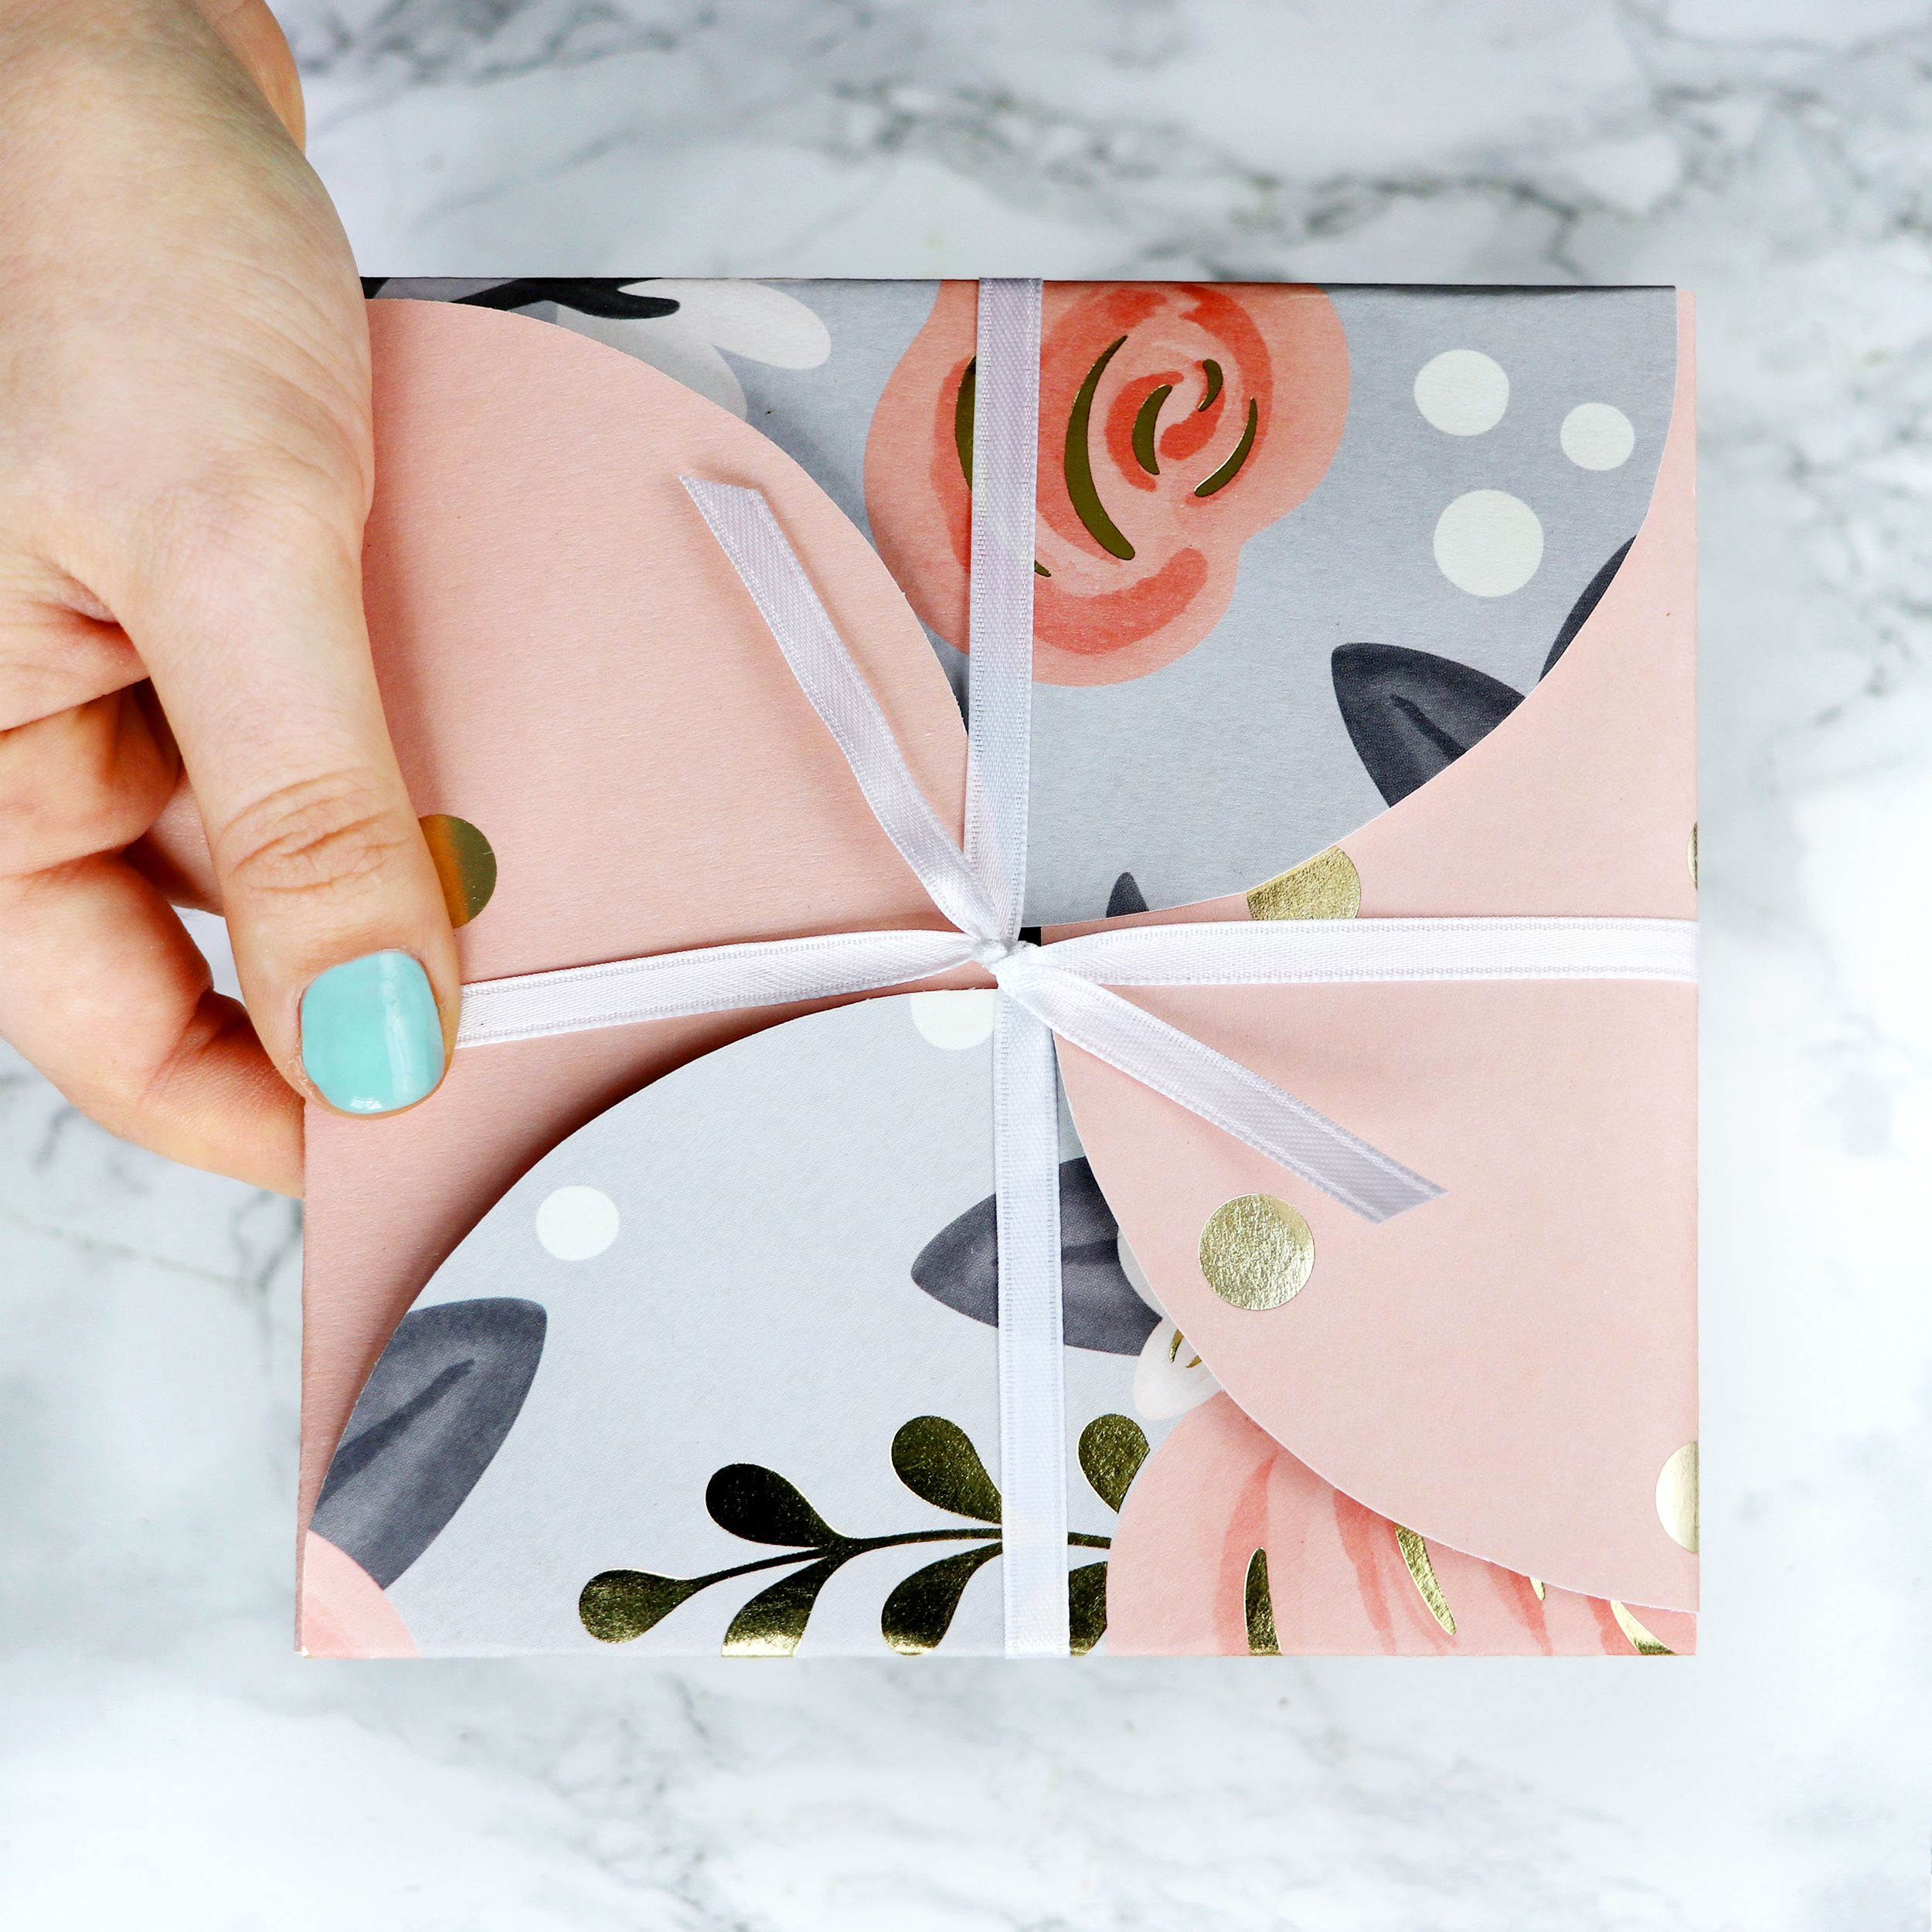 Diy Christmas Gift Card Holder: DIY Circle Envelope Gift Card Holder